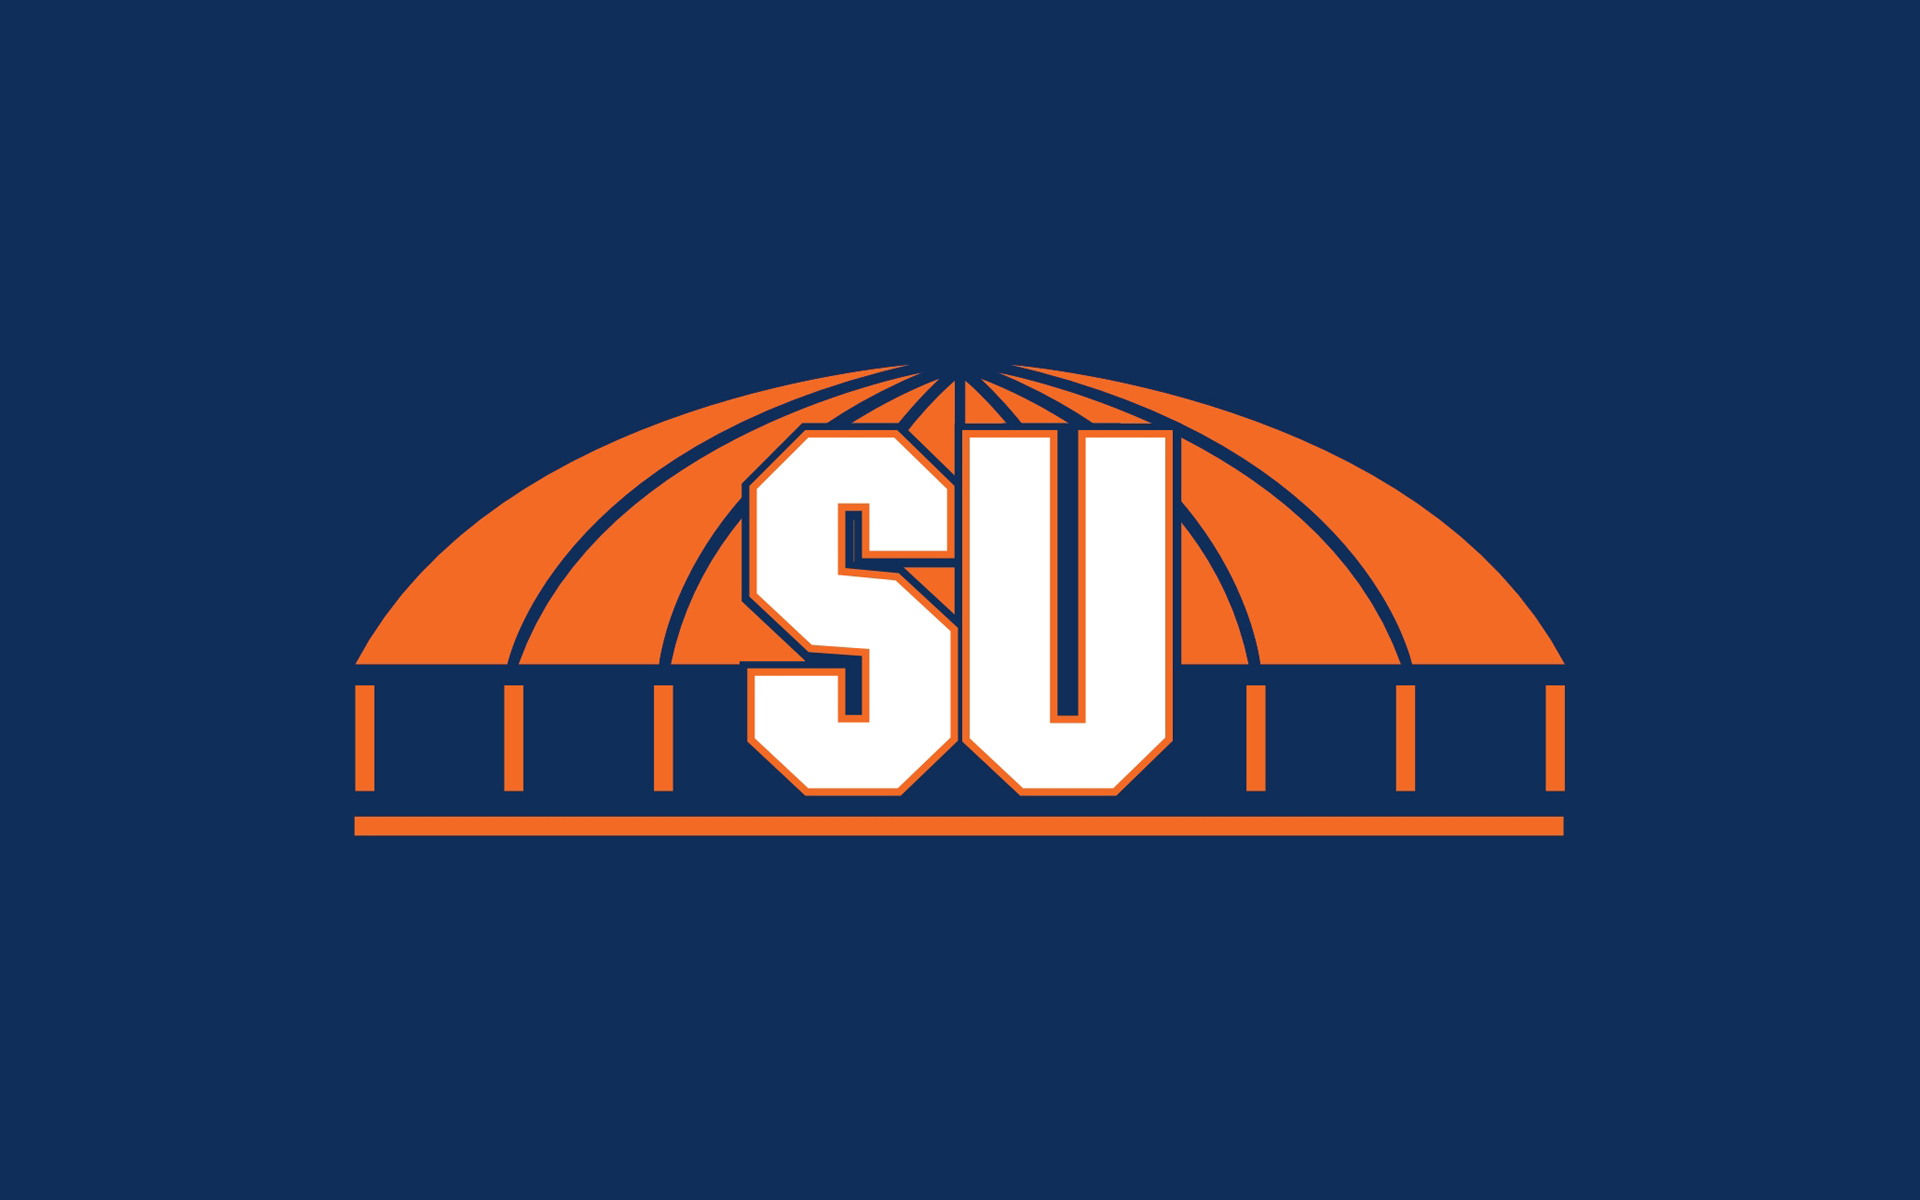 Syracuse Logo Wallpaper 1920x1200